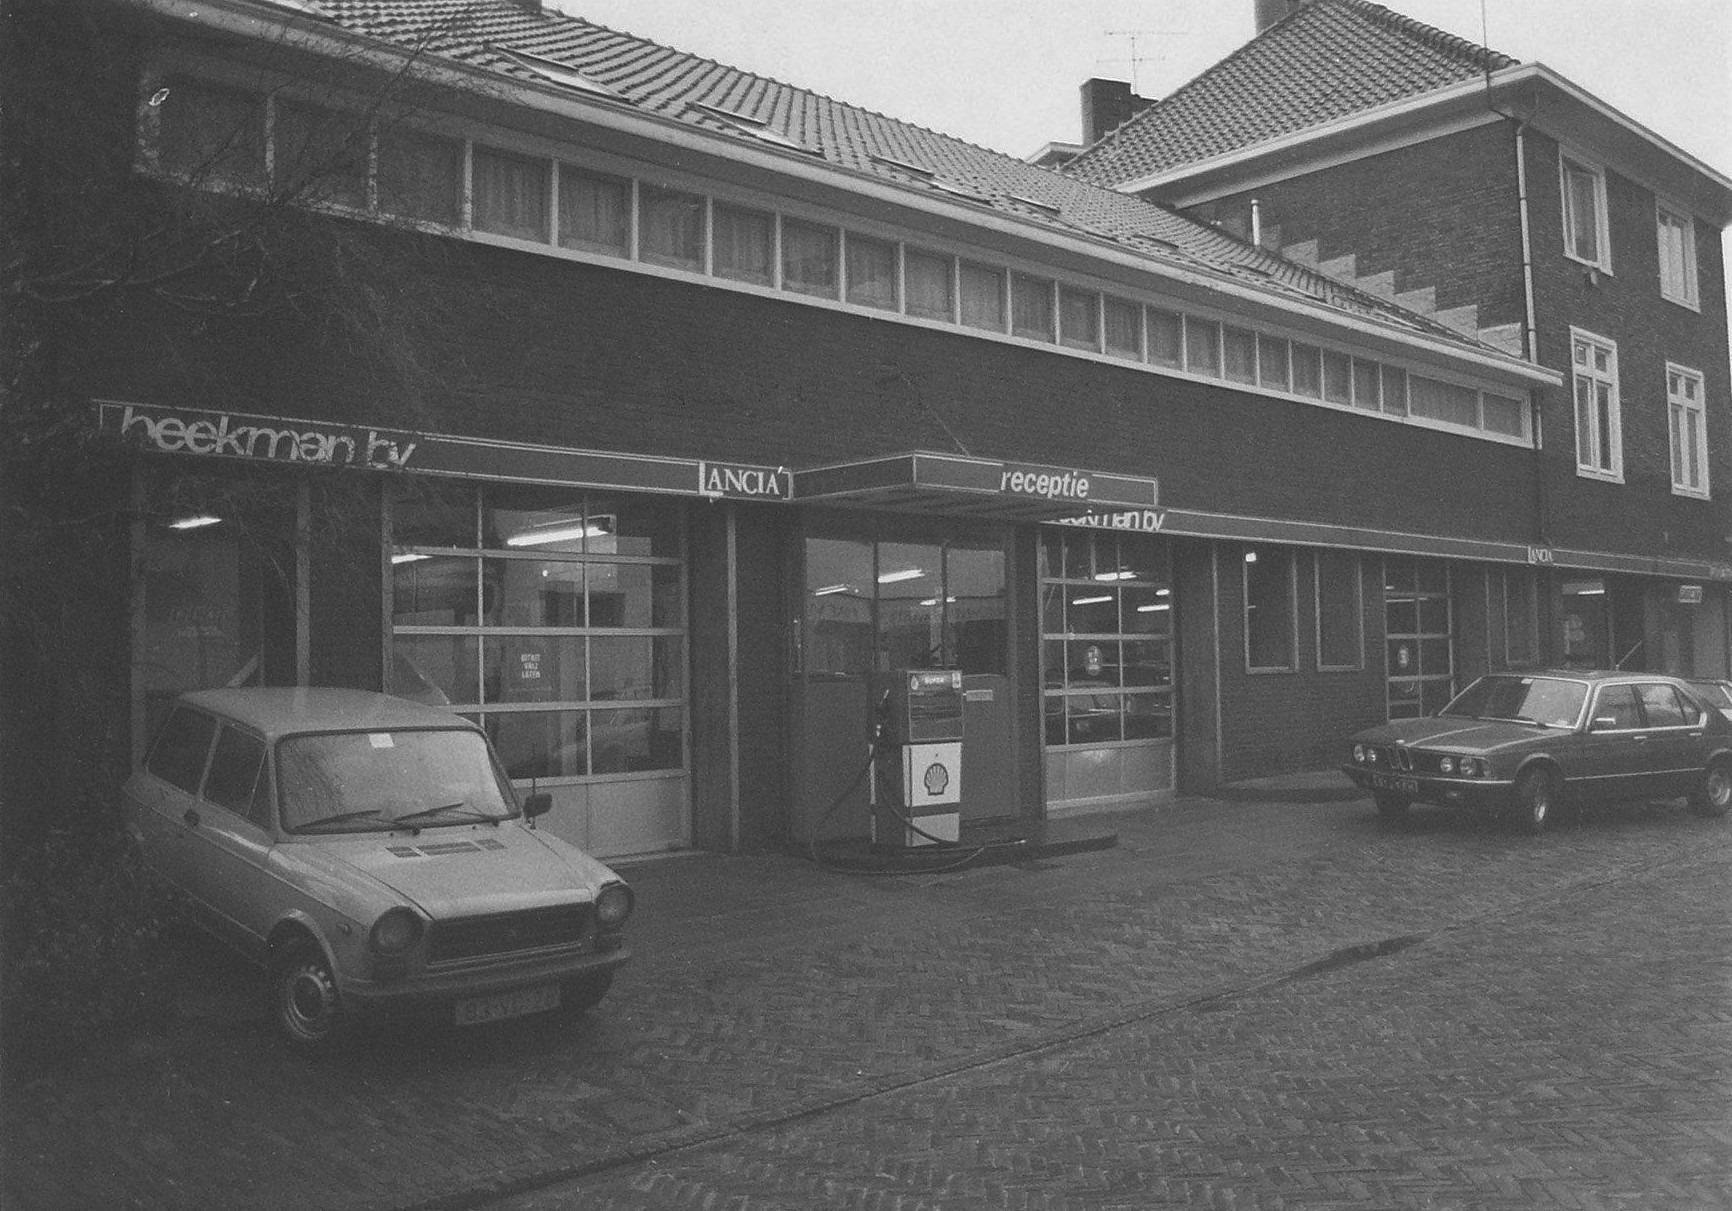 Lancia-1982-Haarlem